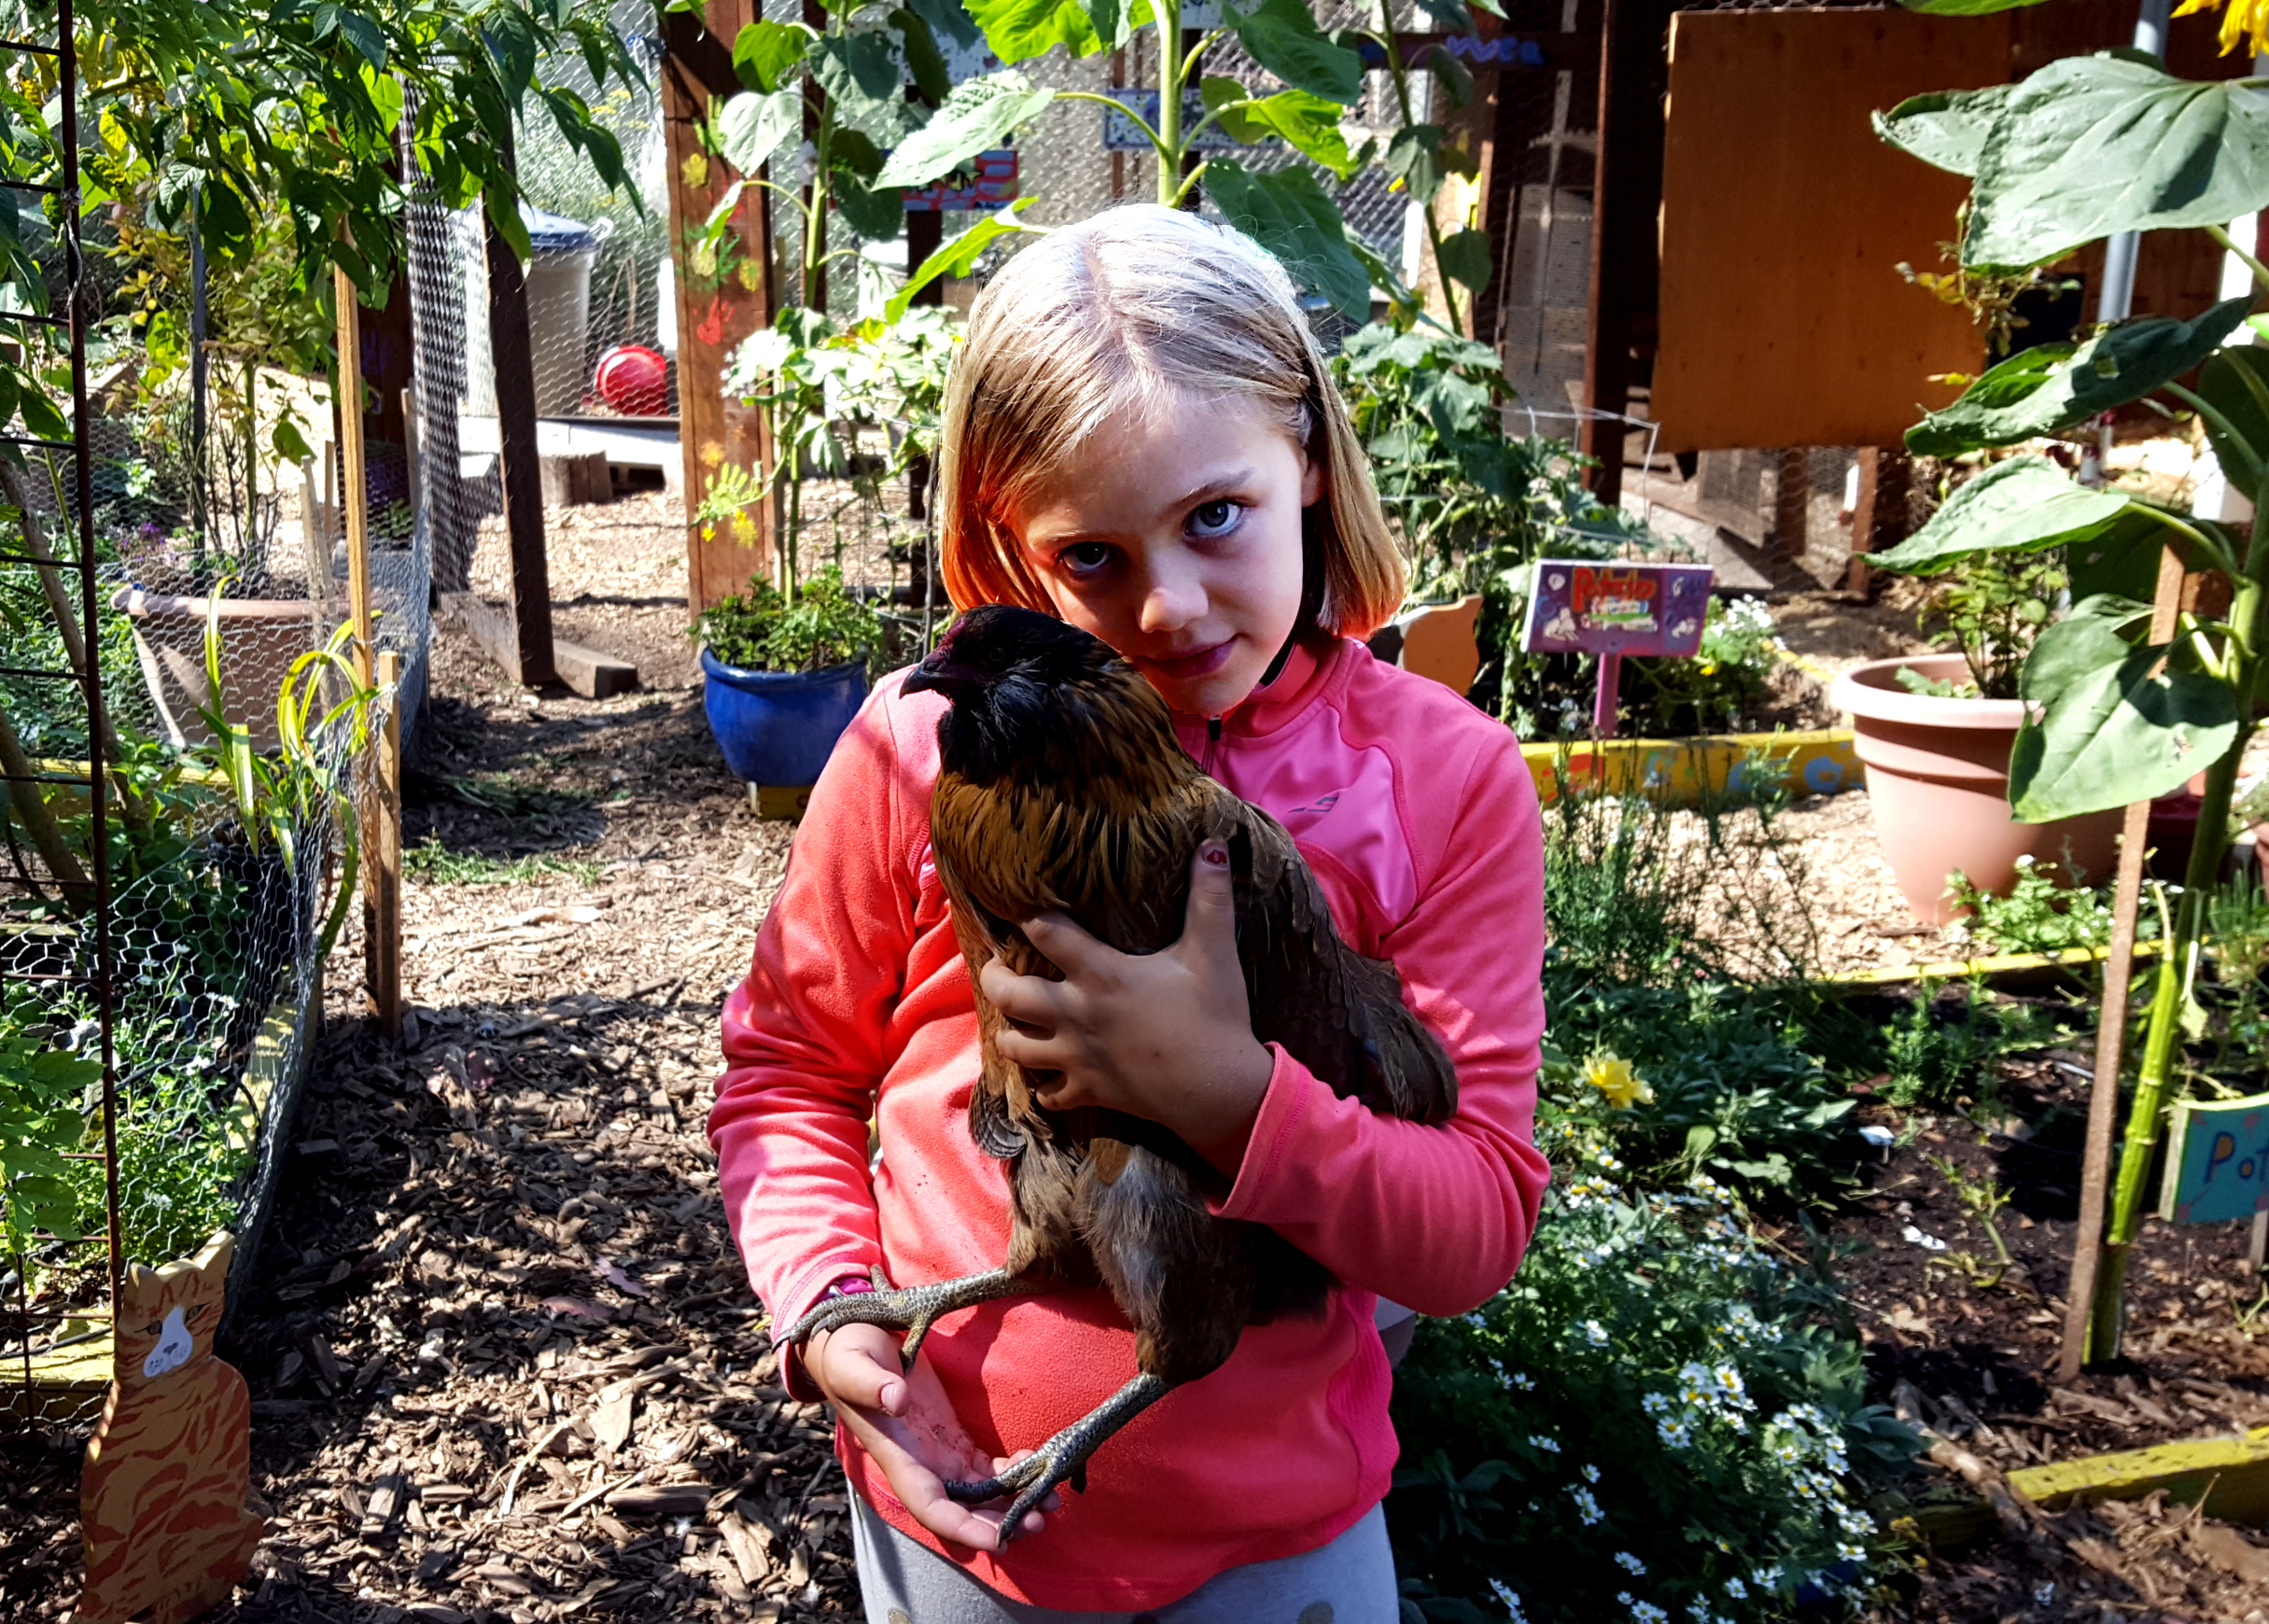 chickens_julia_rocket_630x451